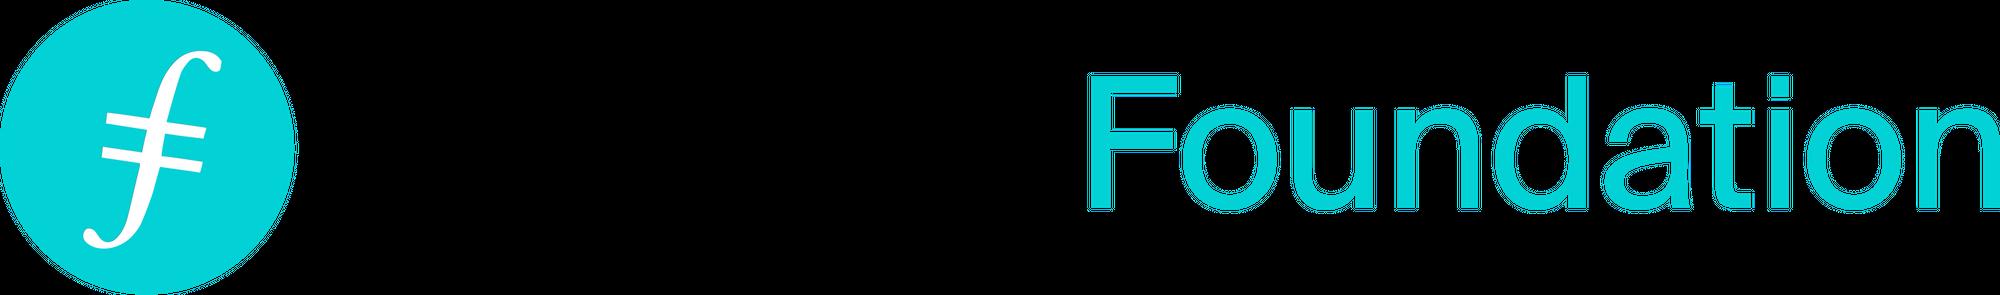 Sponsor filecoin